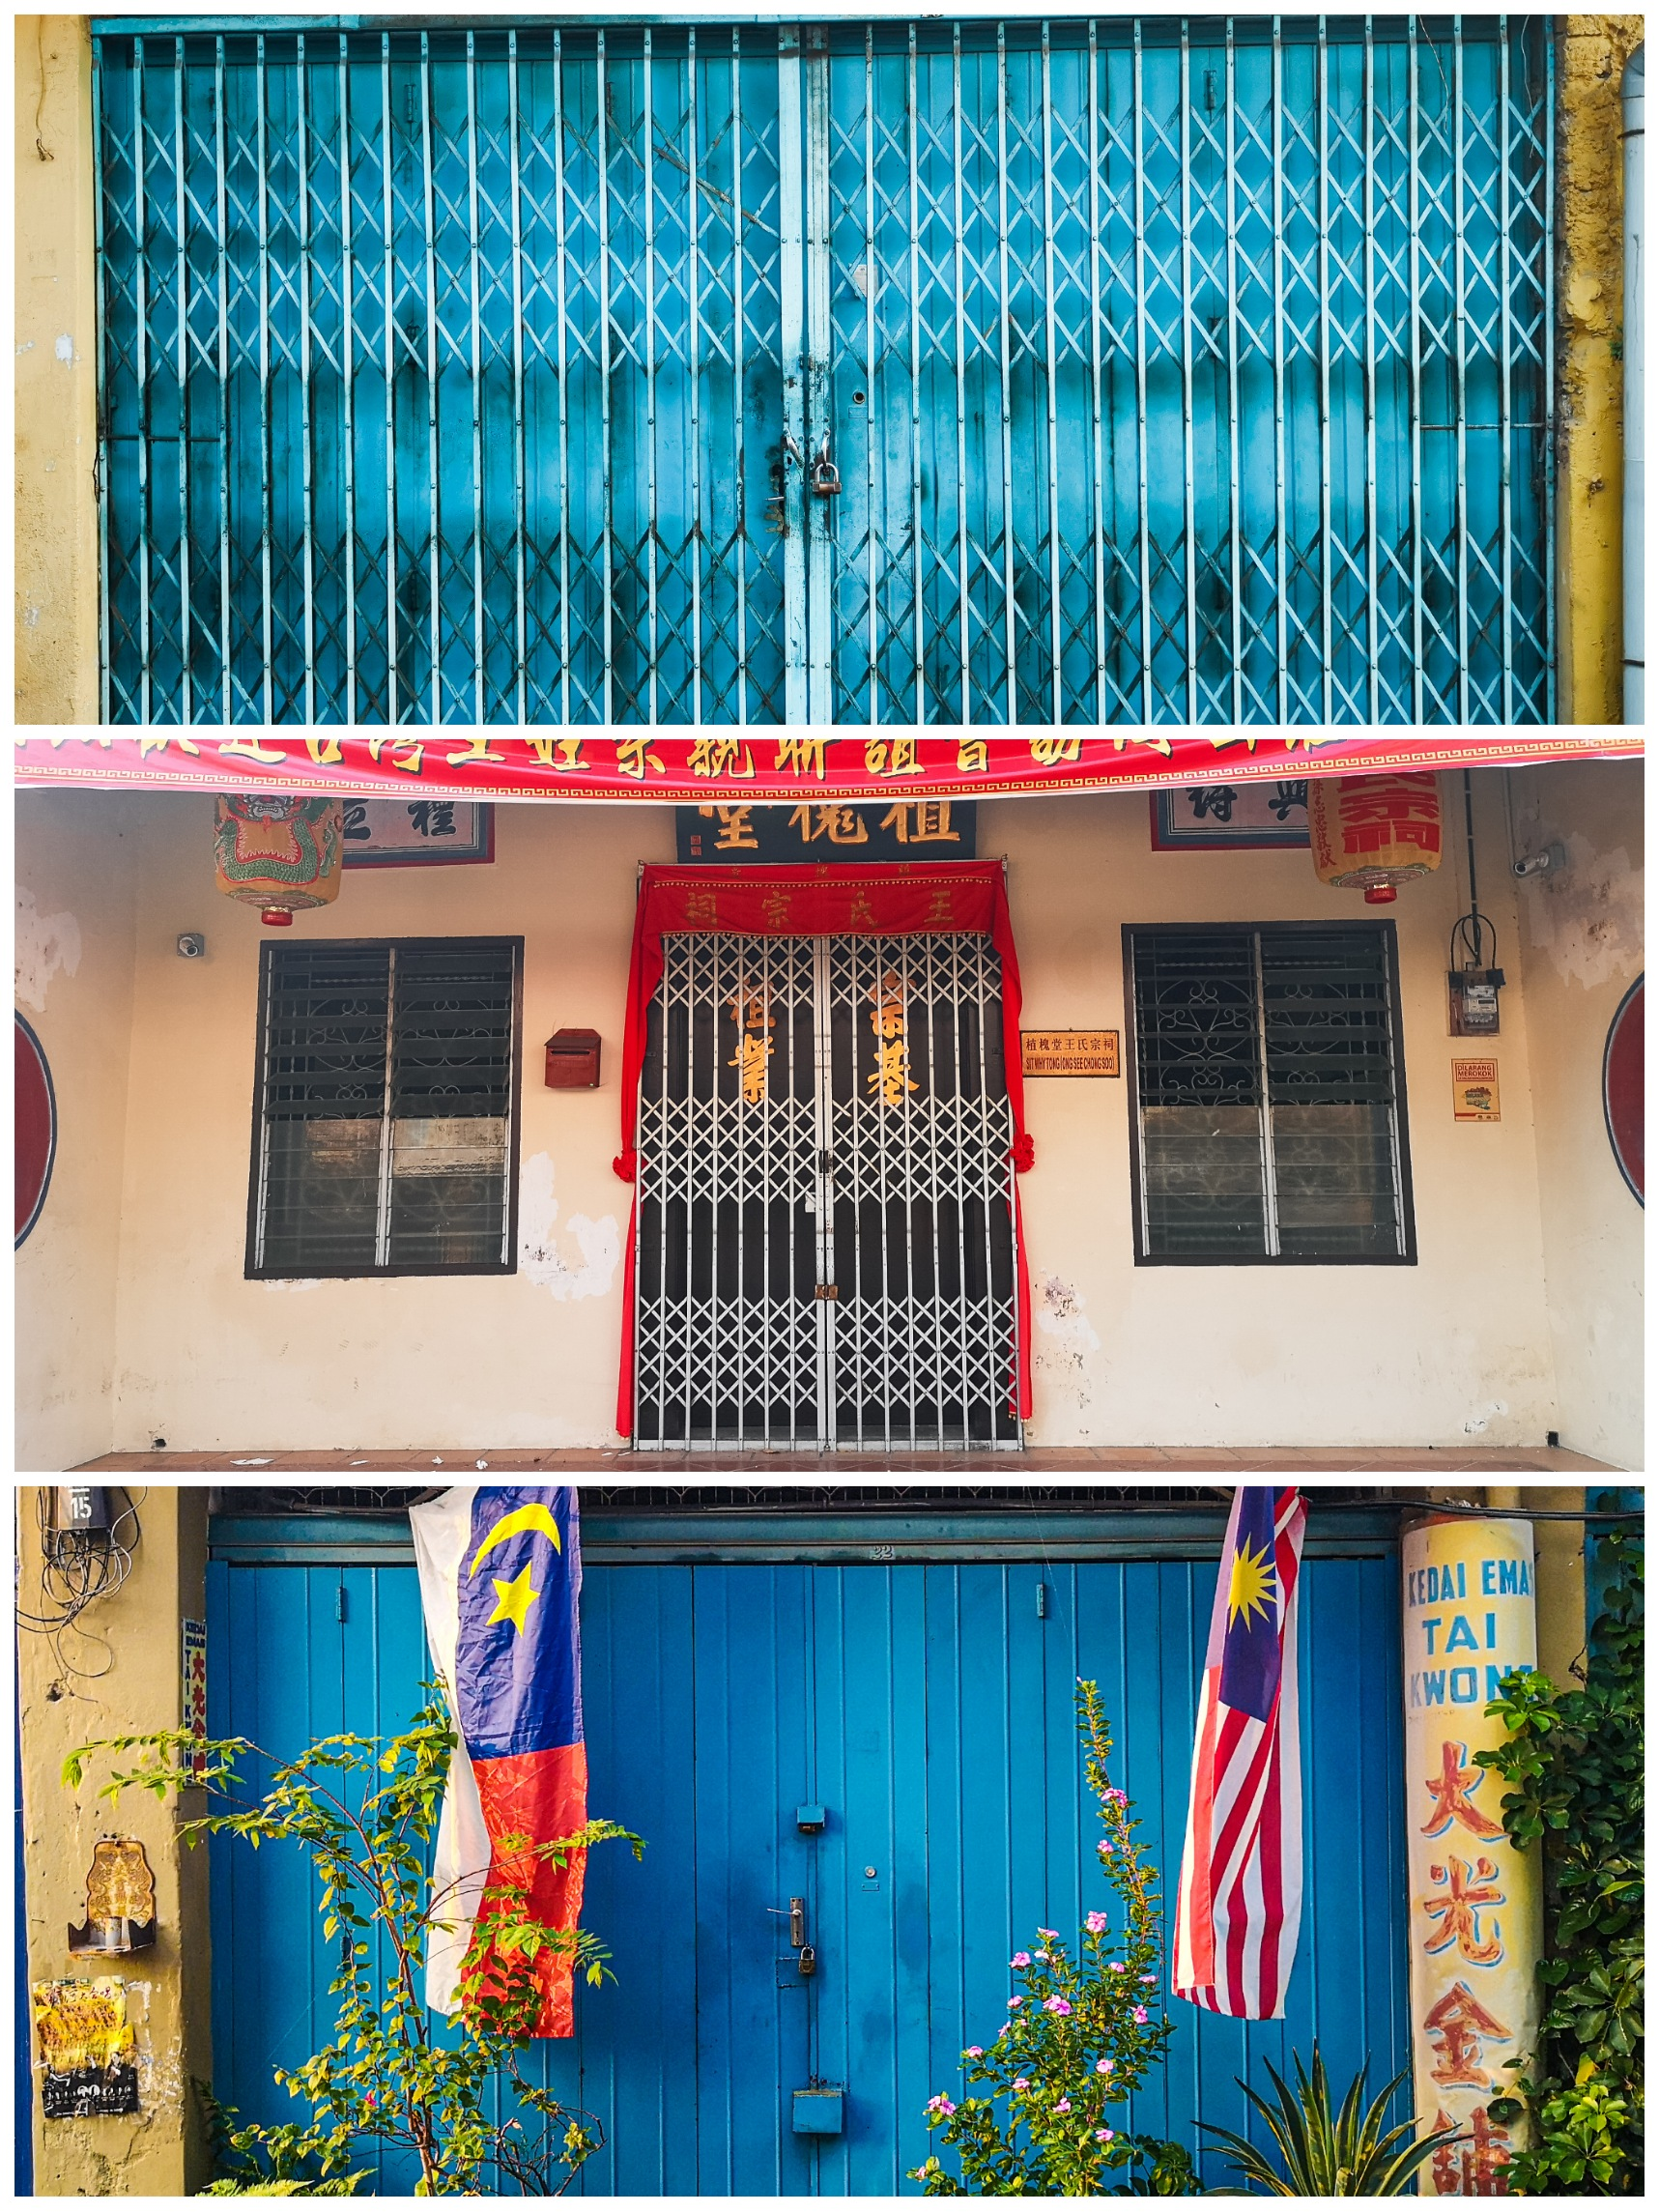 Mobile Photography Di Melaka Bersama Huawei P20 Pro